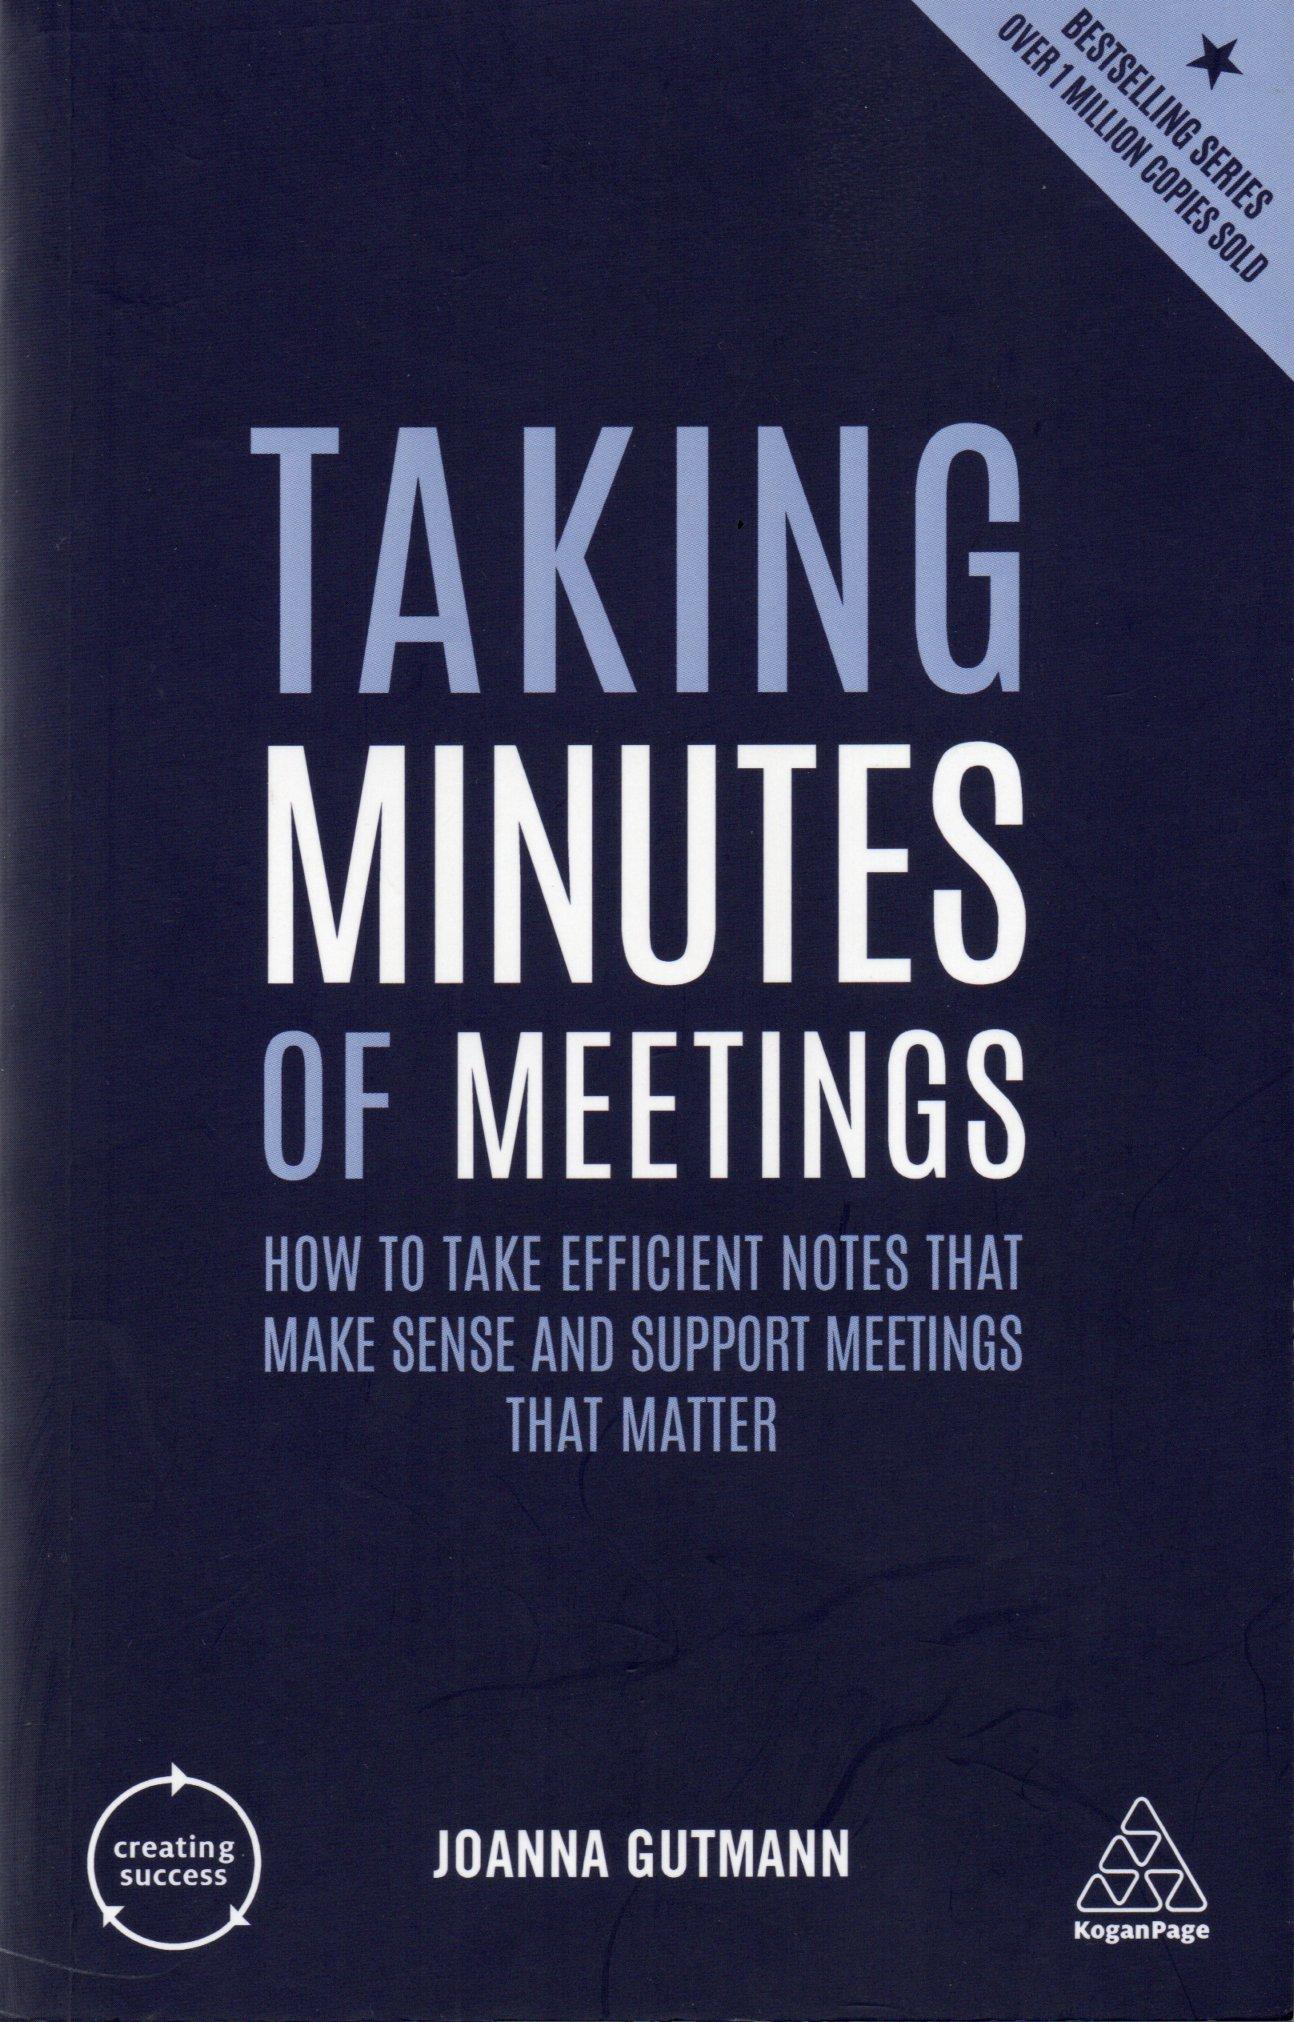 Taking minutes of meeting / Joanna Gutmann